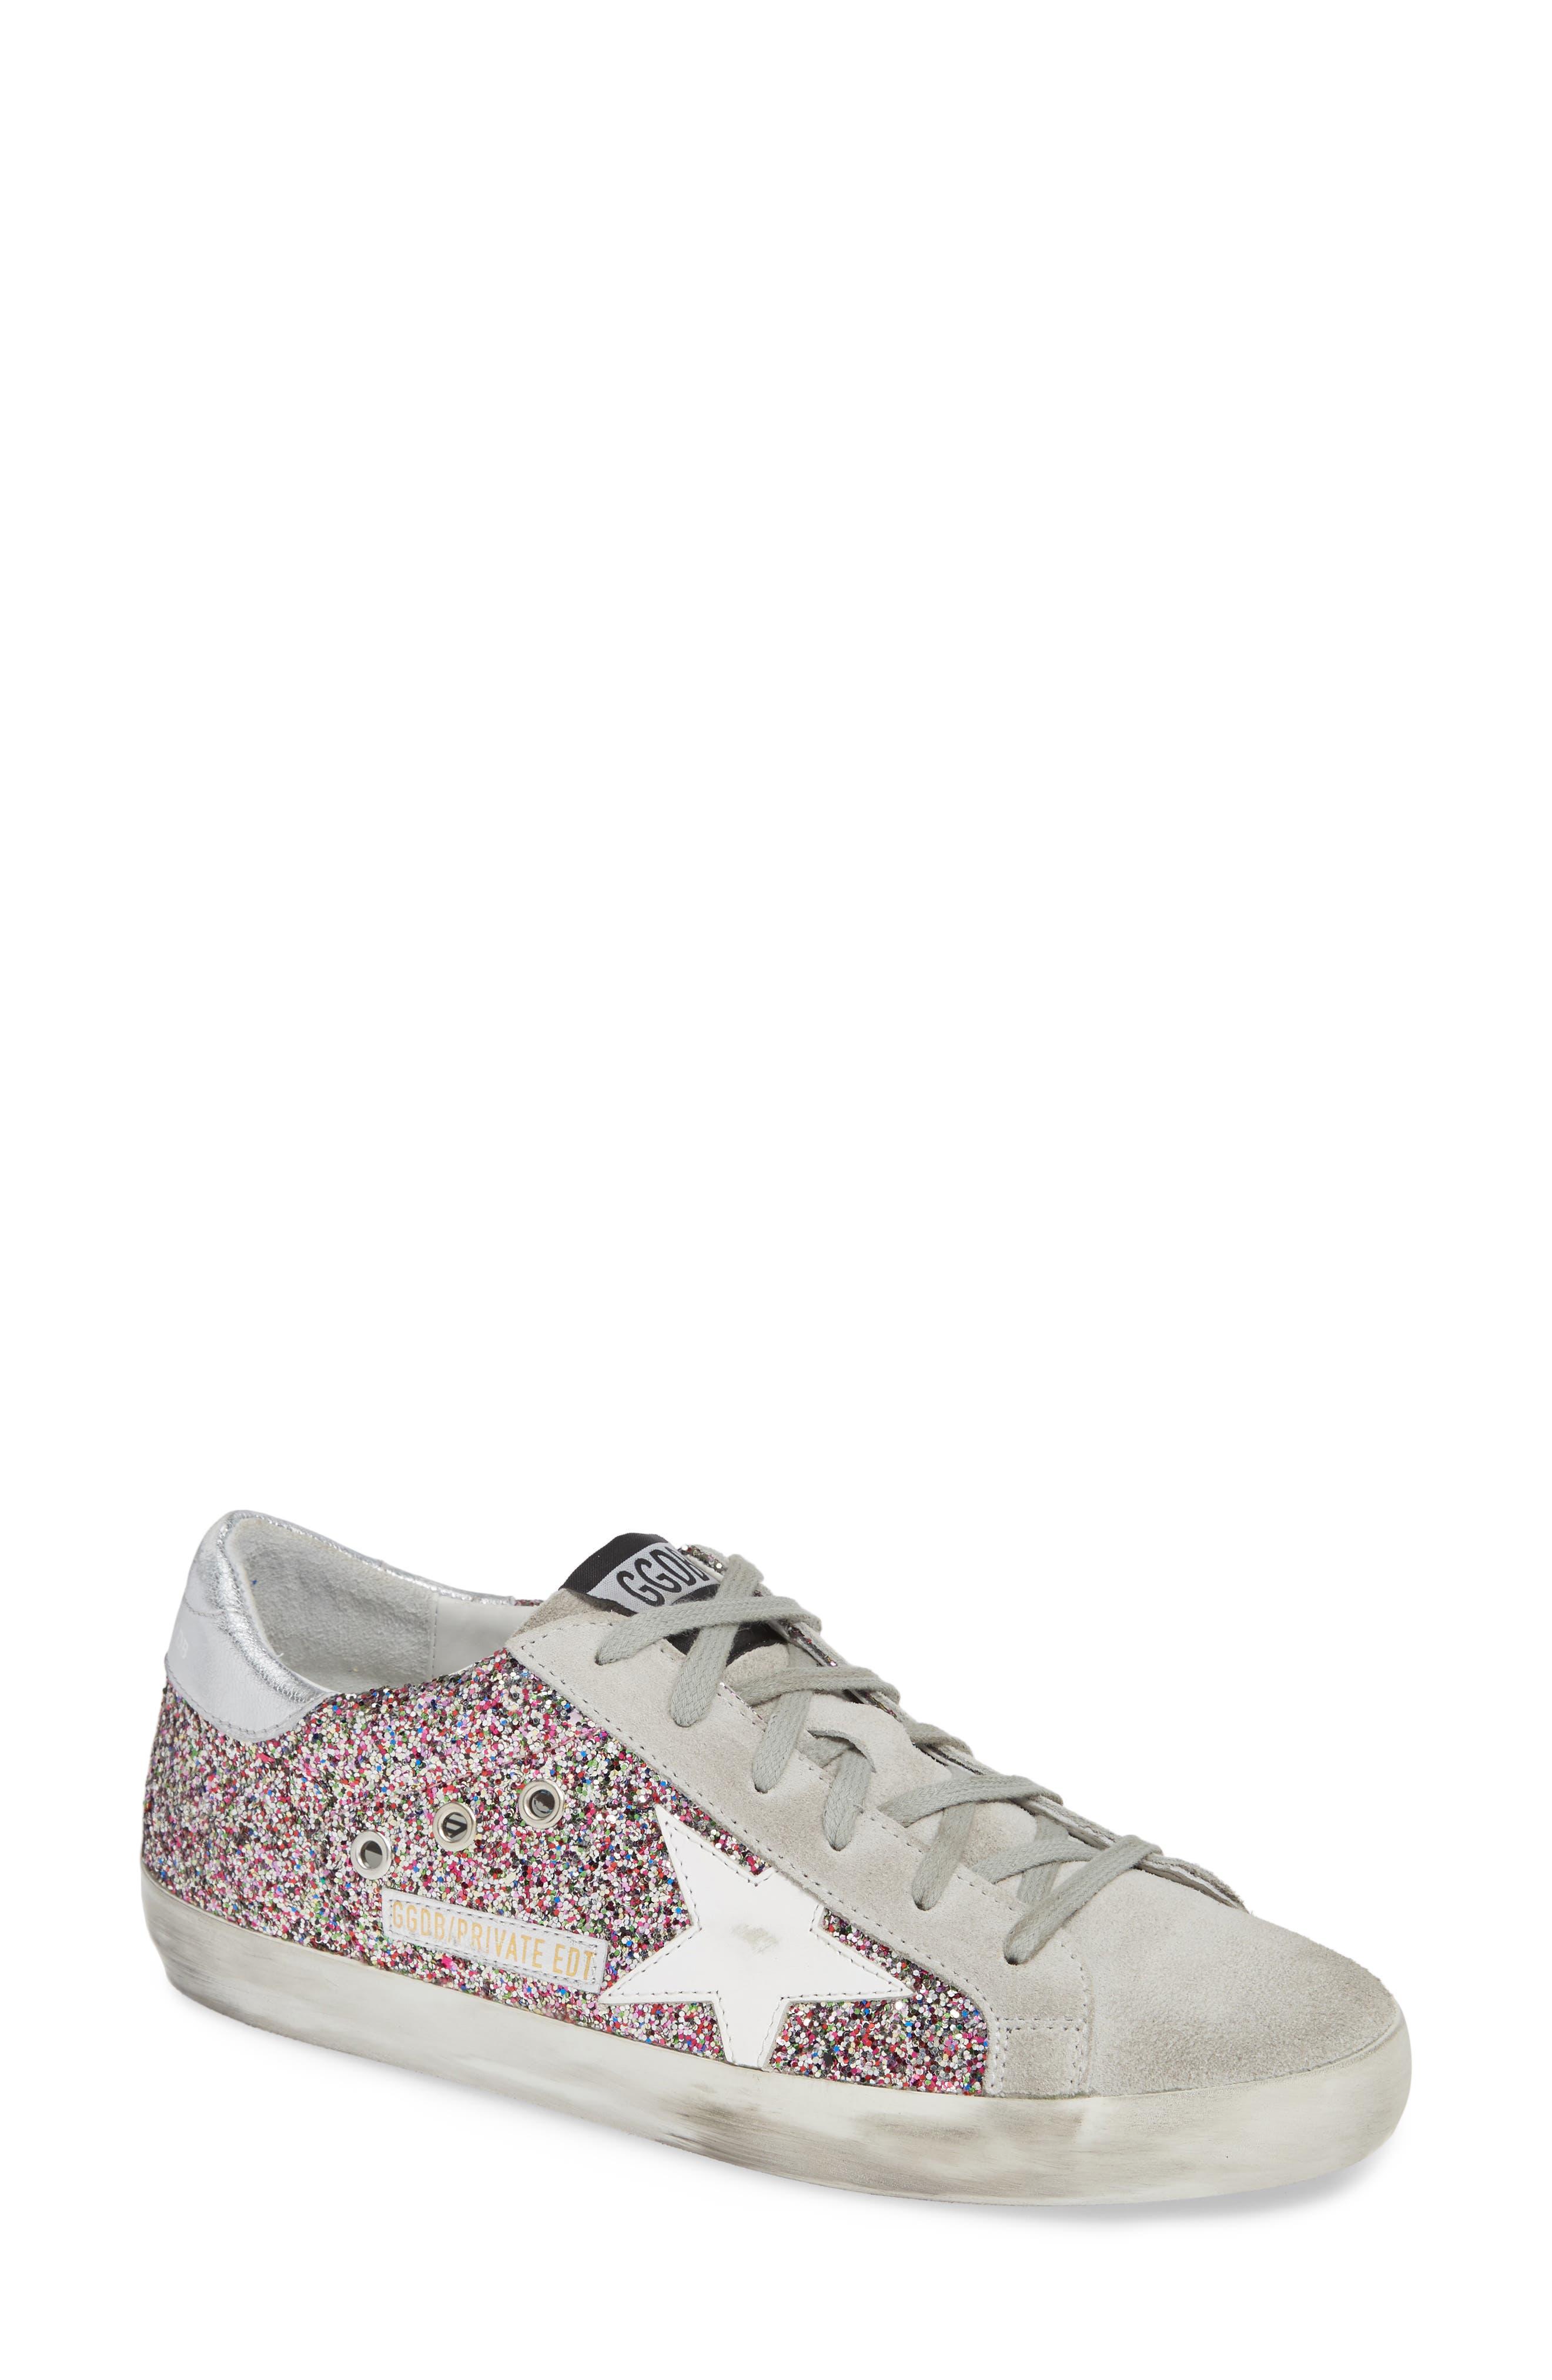 Superstar Glitter Sneaker,                             Main thumbnail 1, color,                             PINK MULTI/ GREY